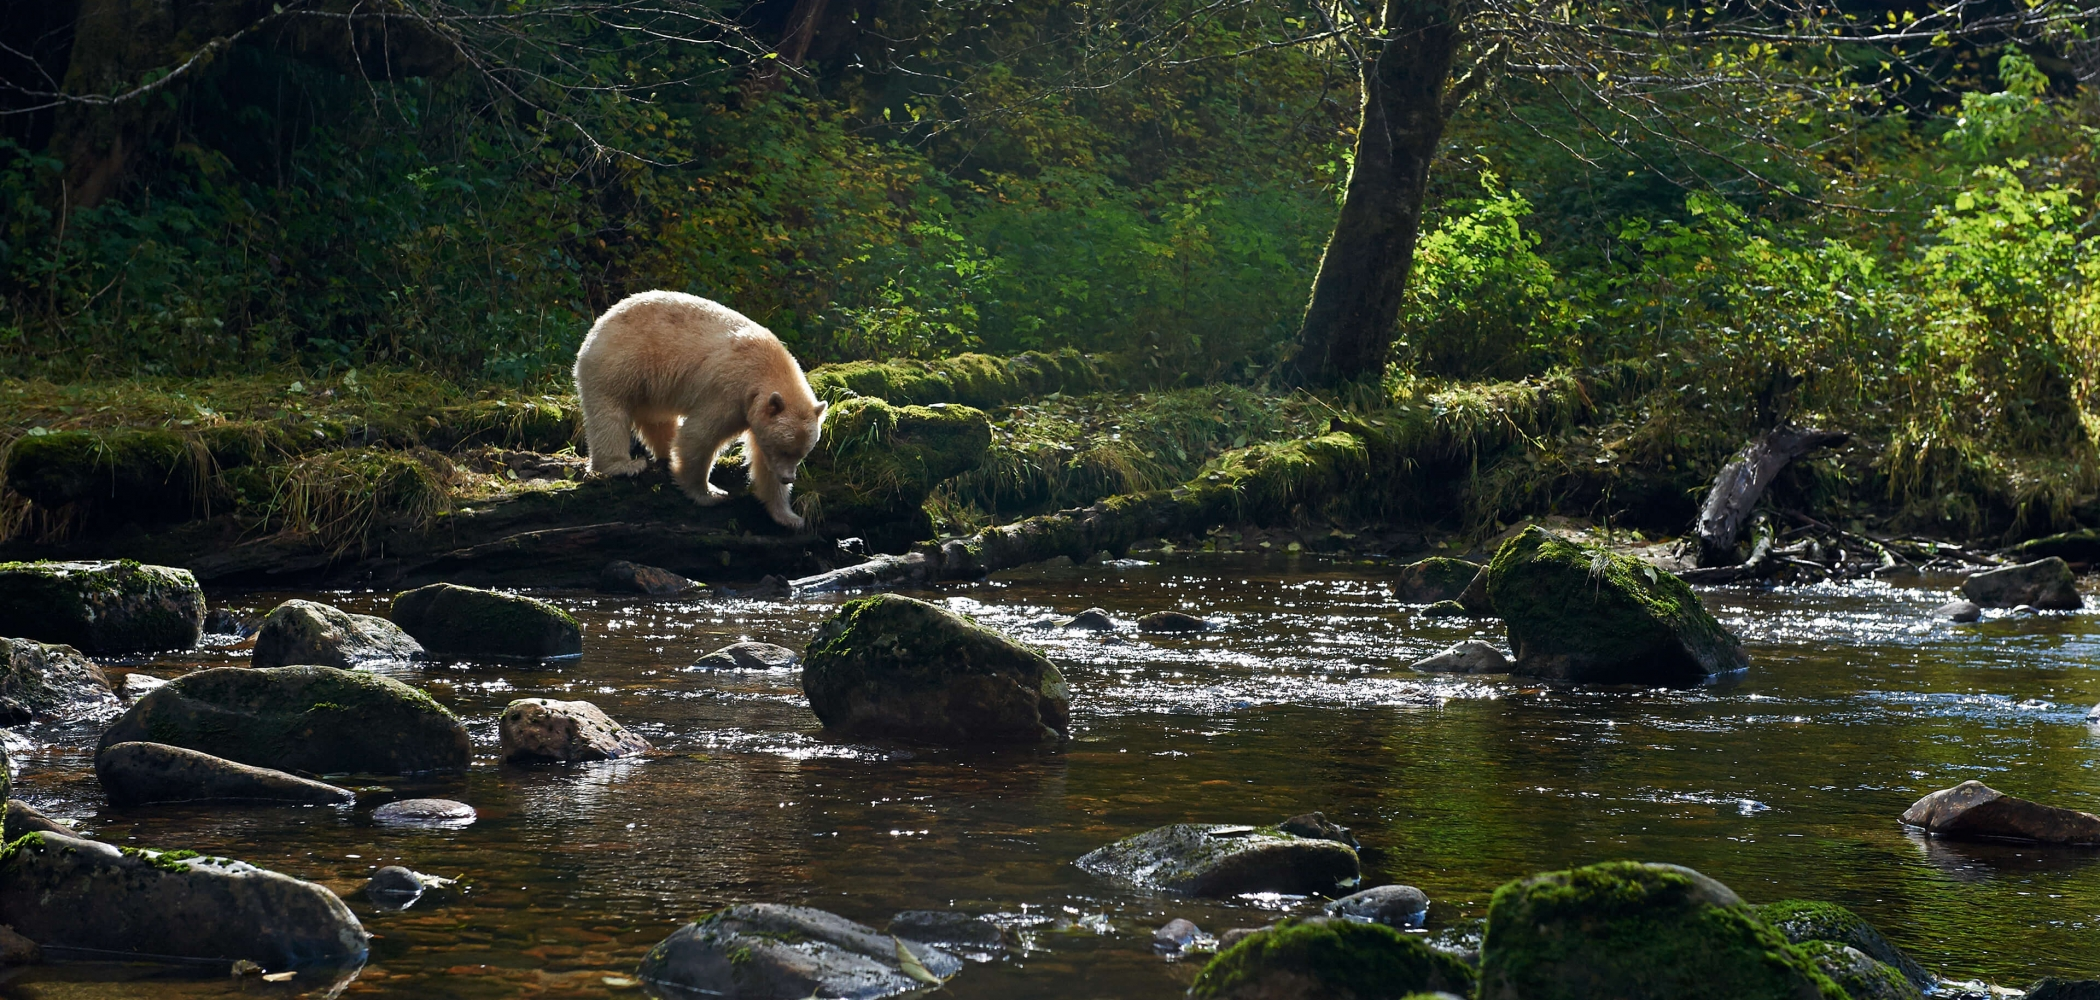 Spirit Bear in the Great Bear Rainforest. Photo: Stephen Harrington